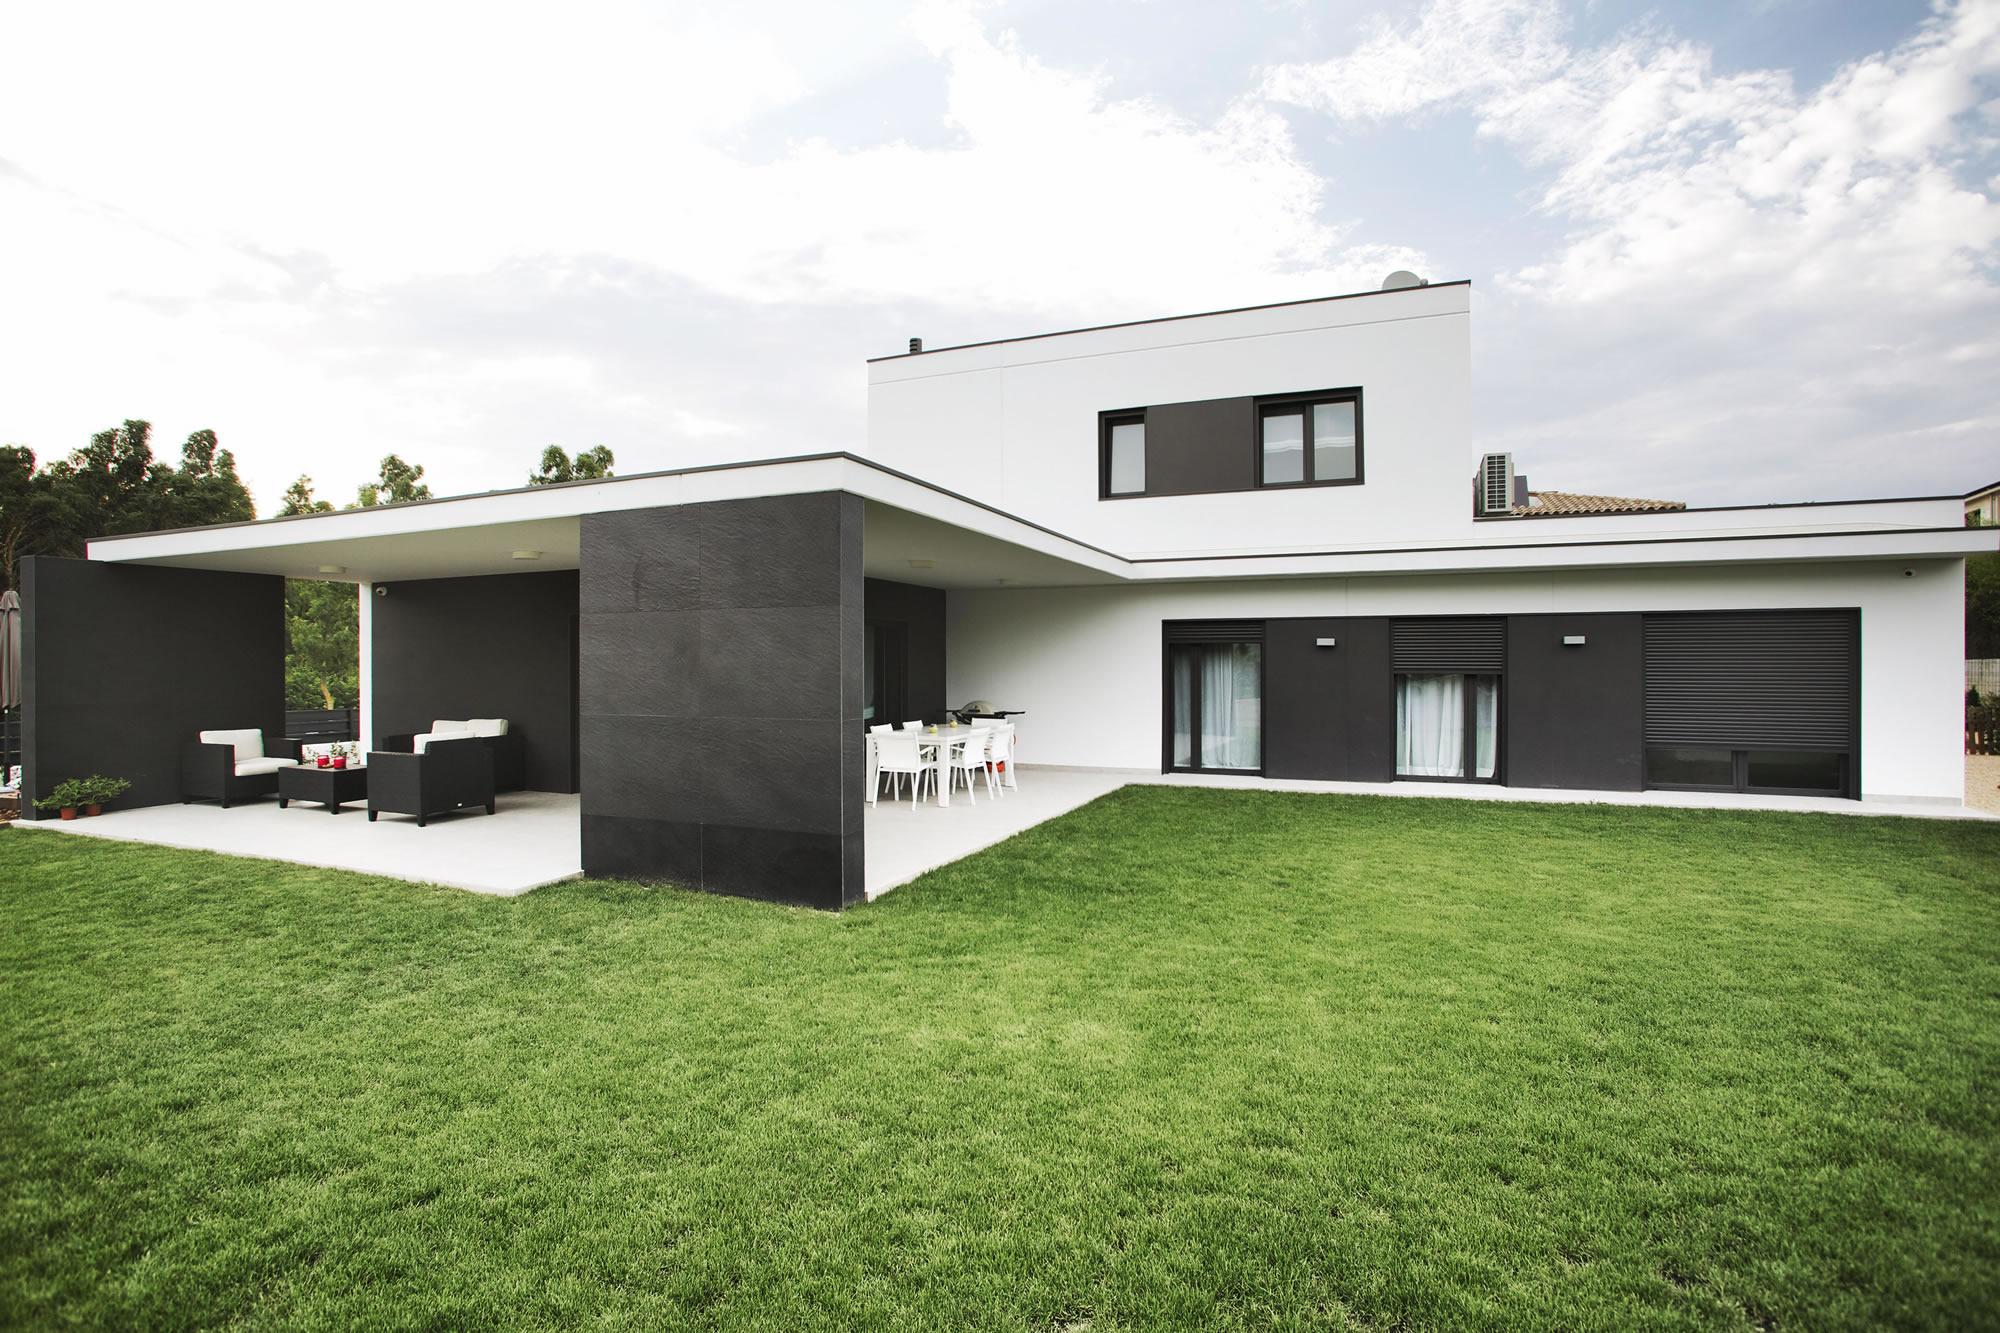 Casa girona 2 casas prefabricadas de hormig n hormipresa - Casas prefabricadas hormigon barcelona ...